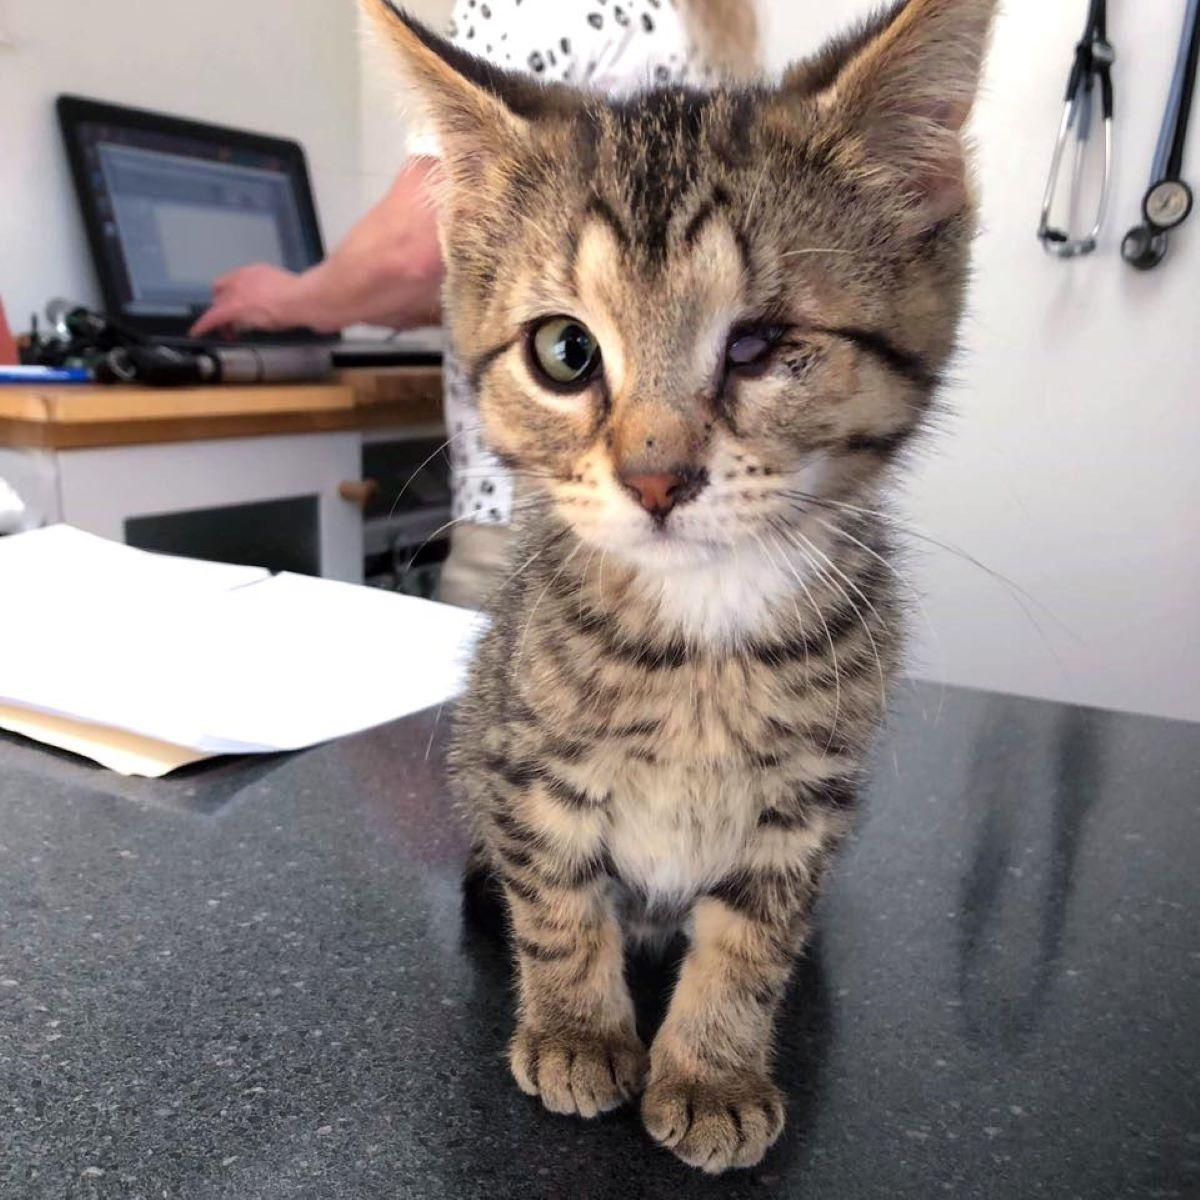 gattino-senza-occhio-su-tavolino